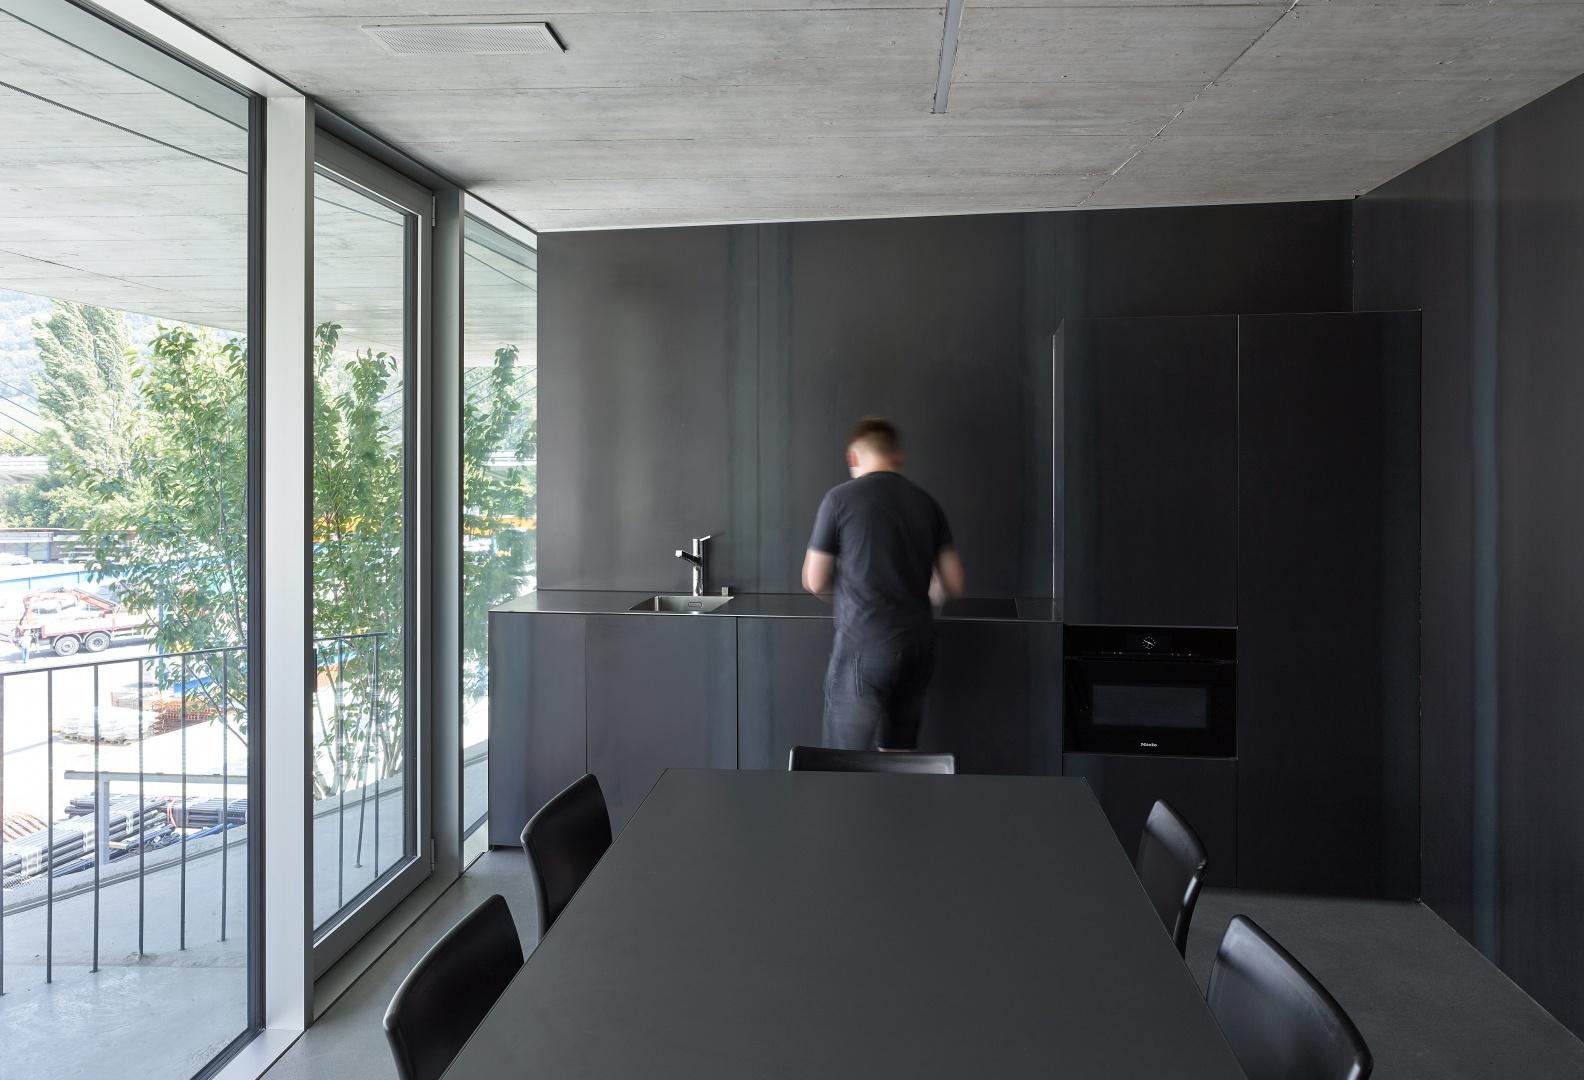 immeuble ronquos 35 savioz fabrizzi réunion © thomas jantscher